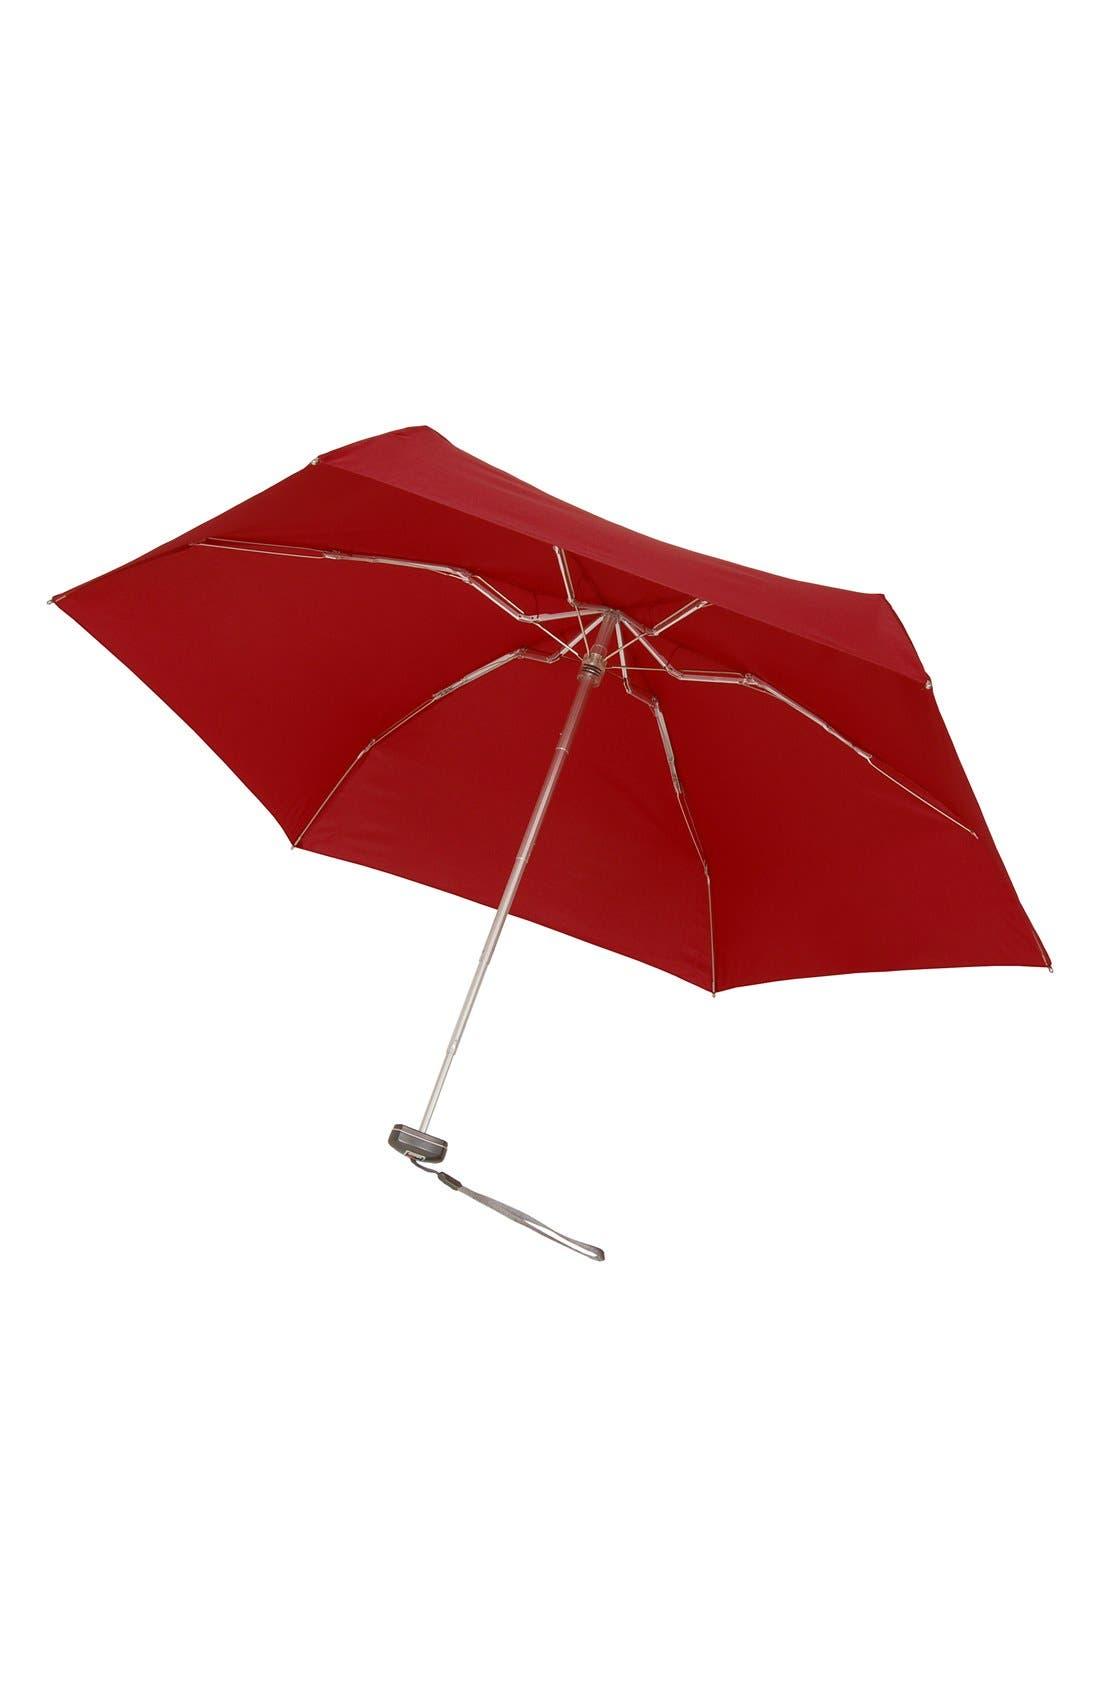 Main Image - Knirps Travel Umbrella